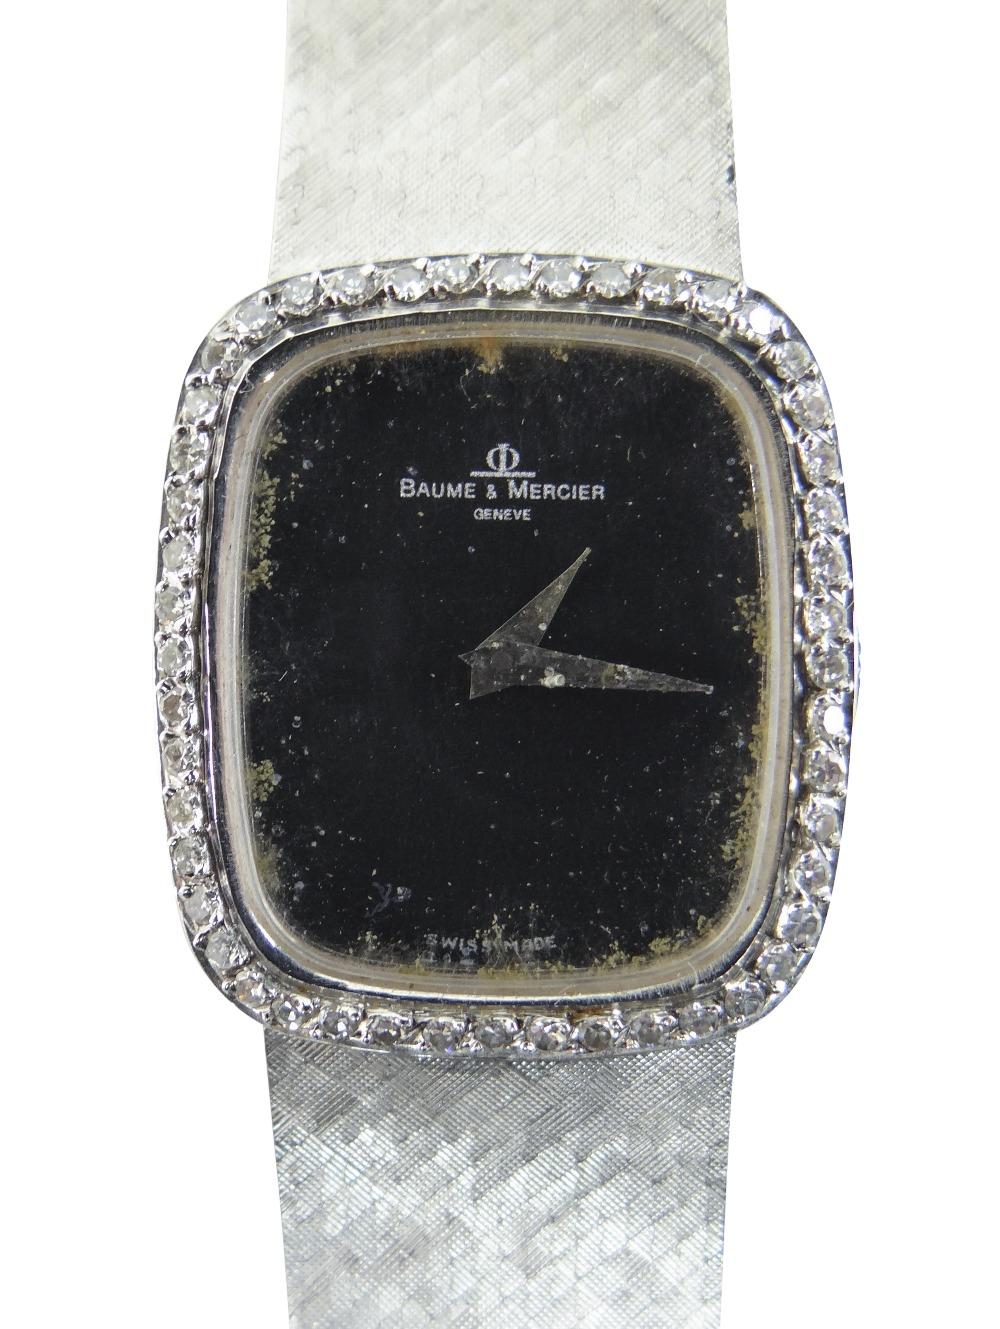 18CT WHITE GOLD (750) BAUME & MERCIER WRISTWATCH having diamond set bezel and integrated strap, 47.4